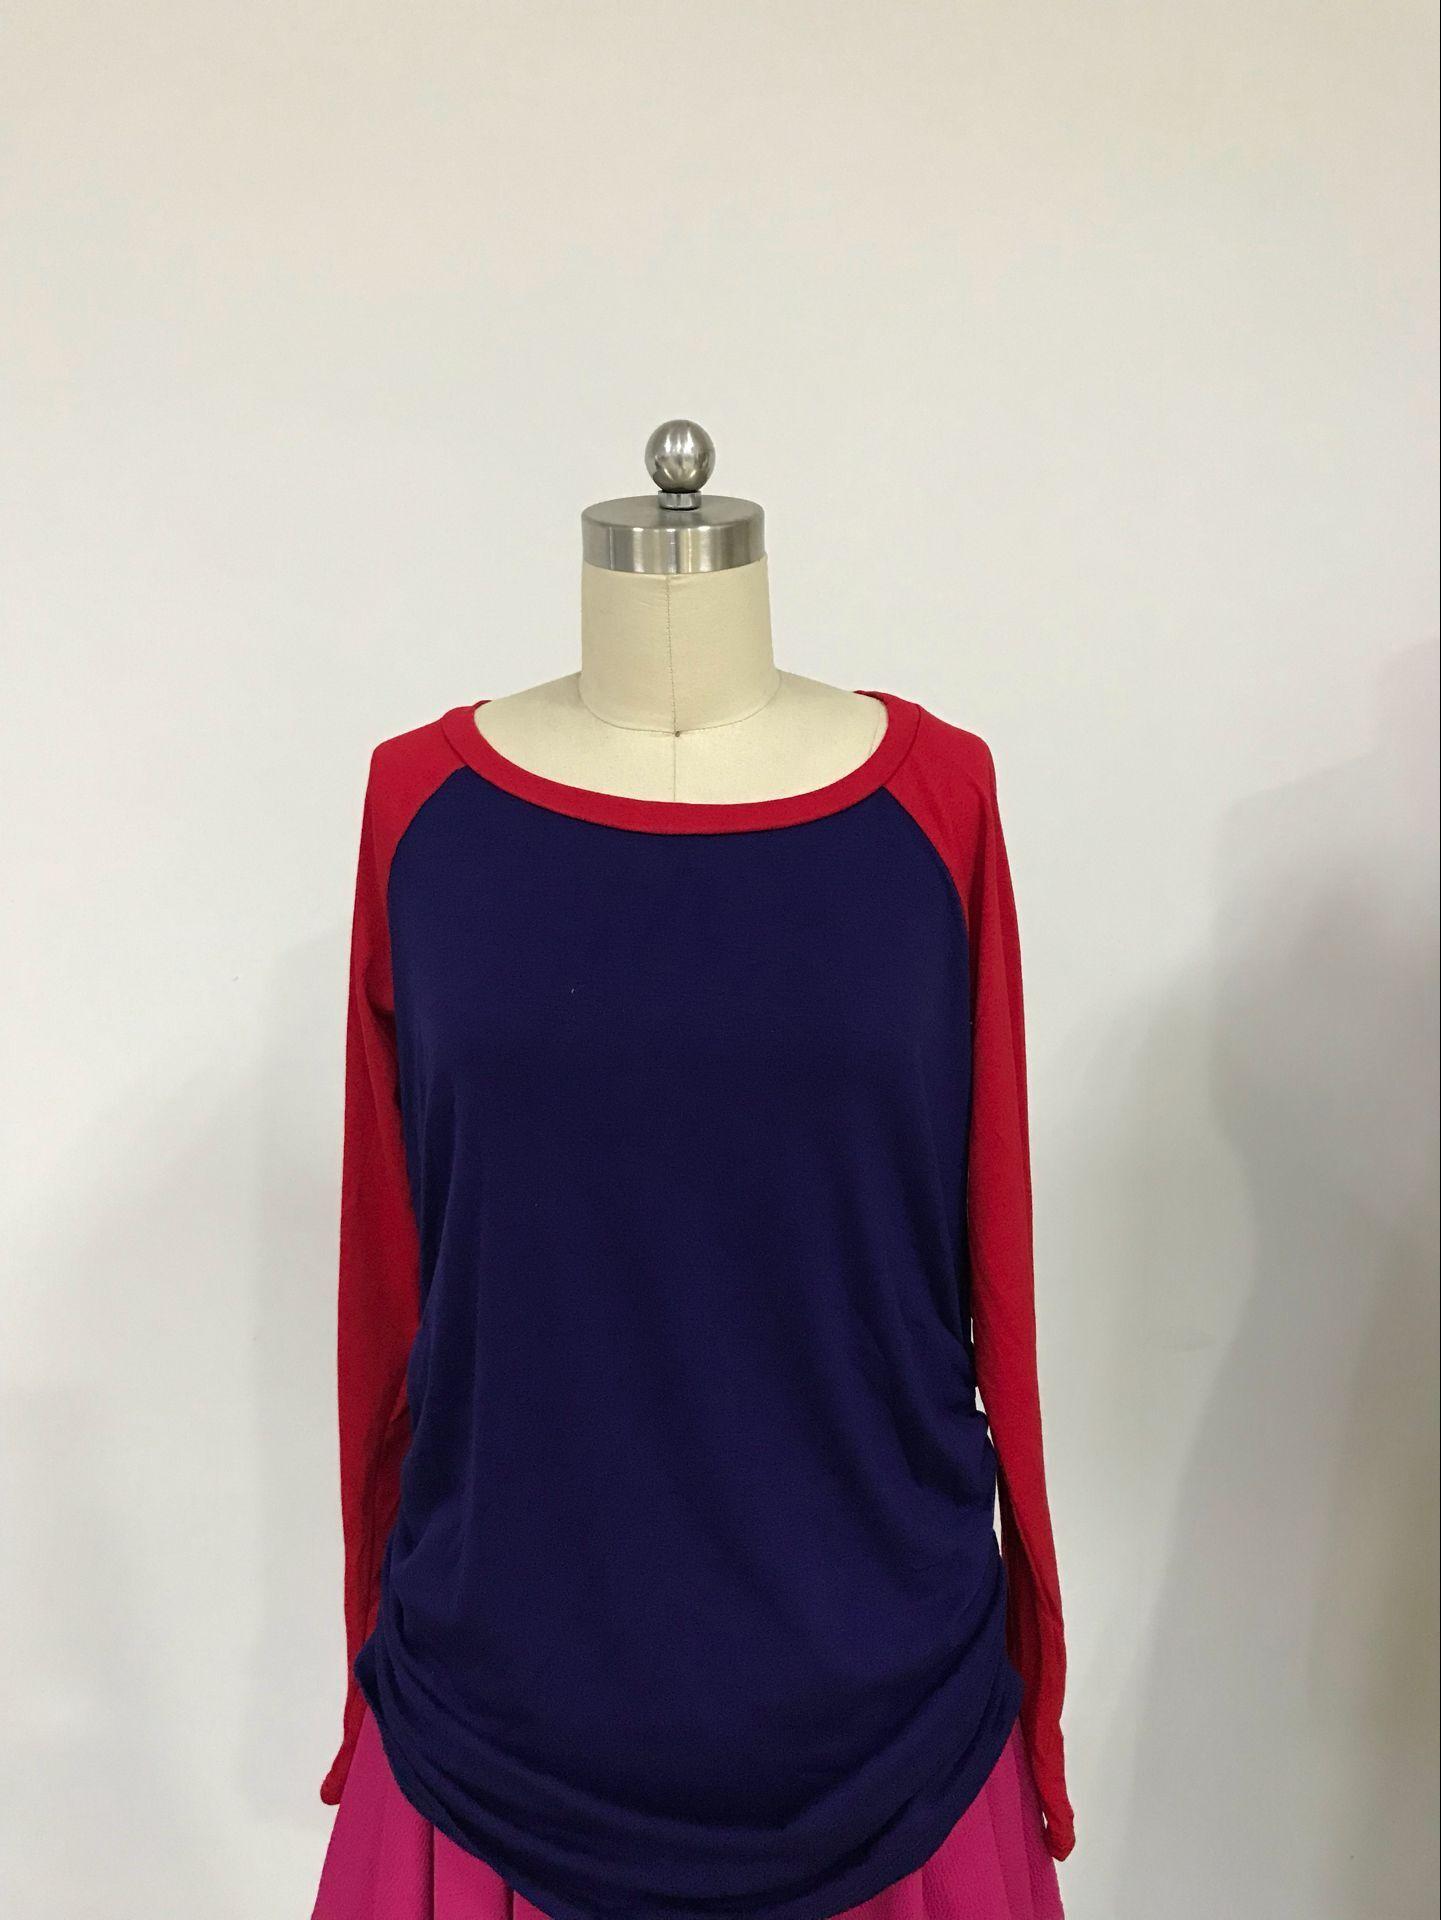 [US Direct] HiMiss Women Long Sleeve Crew Neck Baseball Raglan Maternity T-Shirts Top Royal Blue_XL